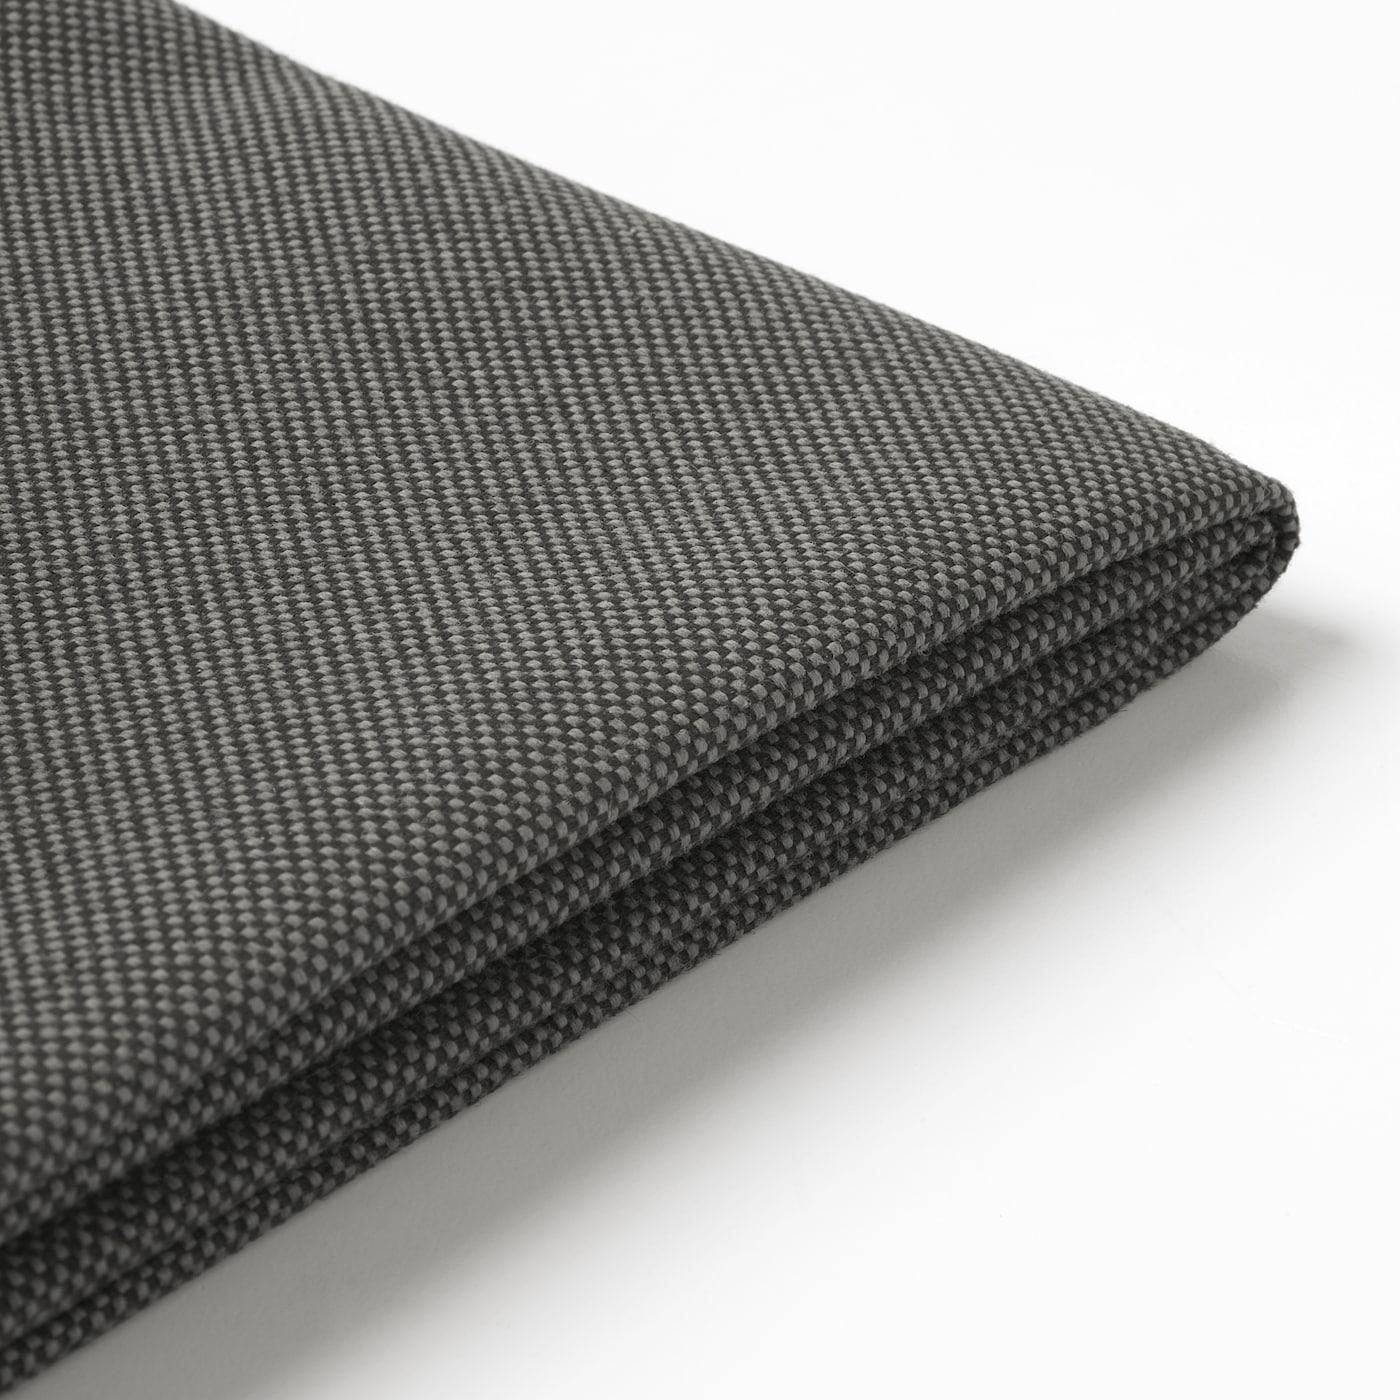 FRÖSÖN Cover for seat cushion, outdoor dark grey, 62x62 cm